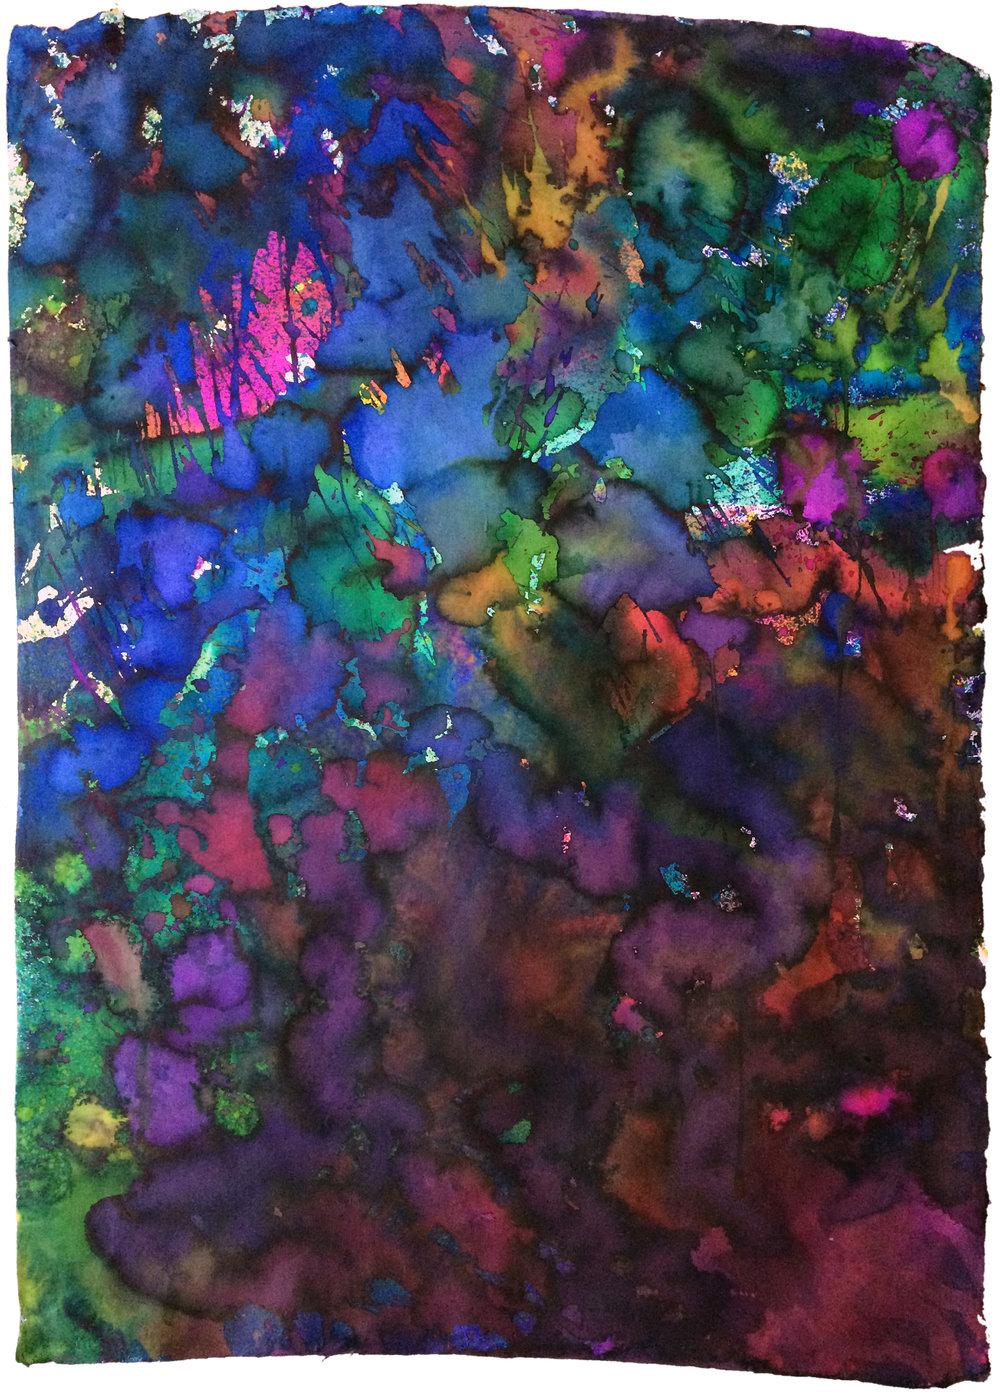 Black 2017 57 x 80 cm Liquid dye on paper